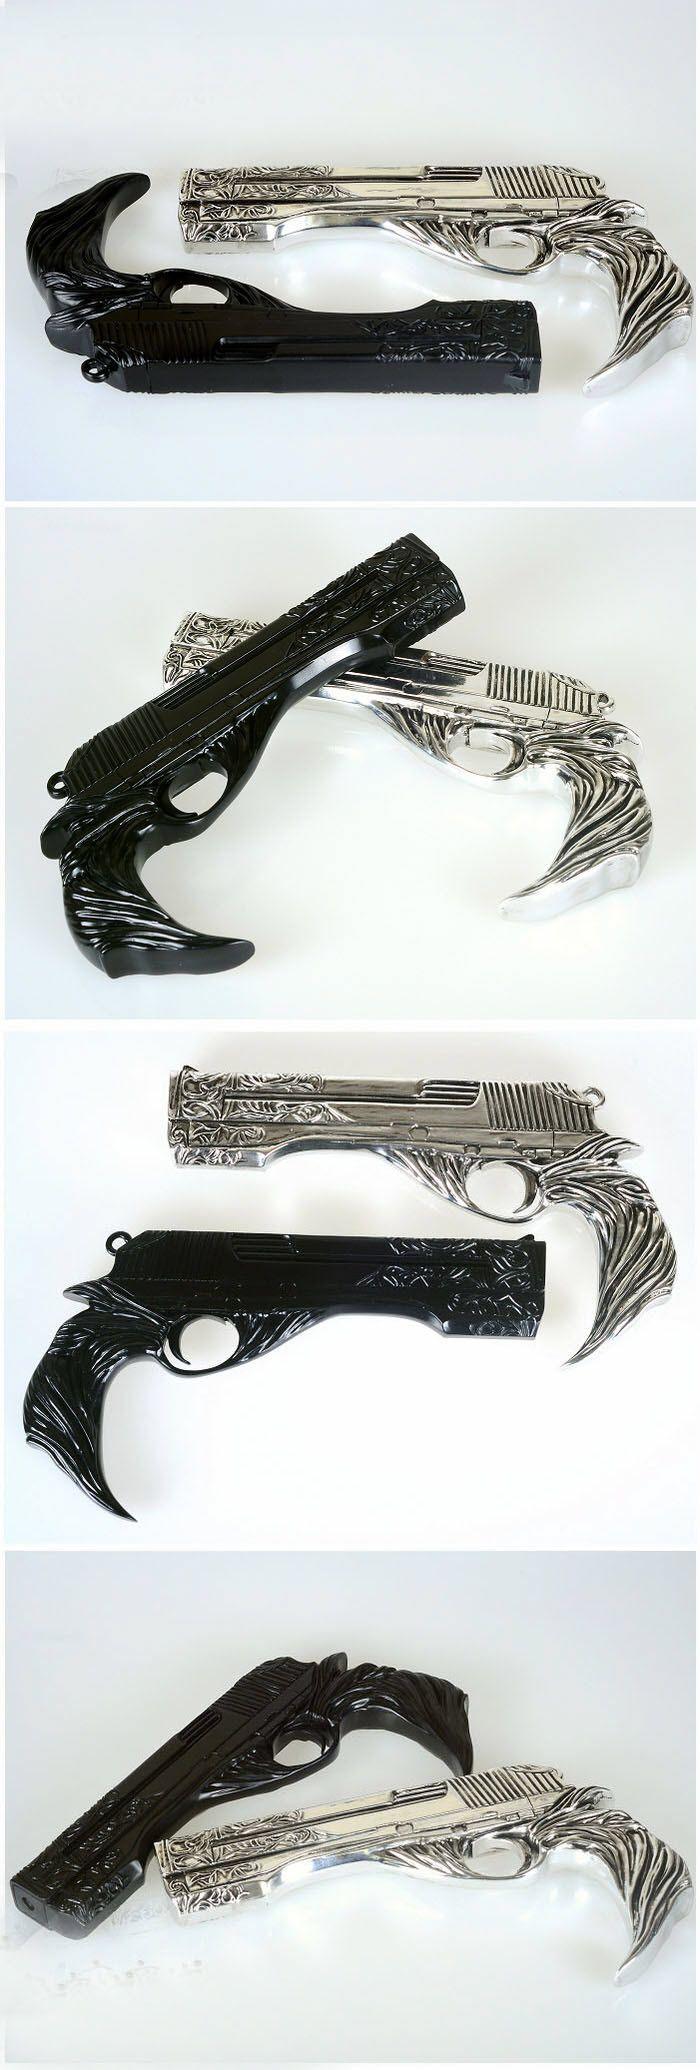 DMC 5 Dante Cosplay Guns Ebony & lvory Cosplay